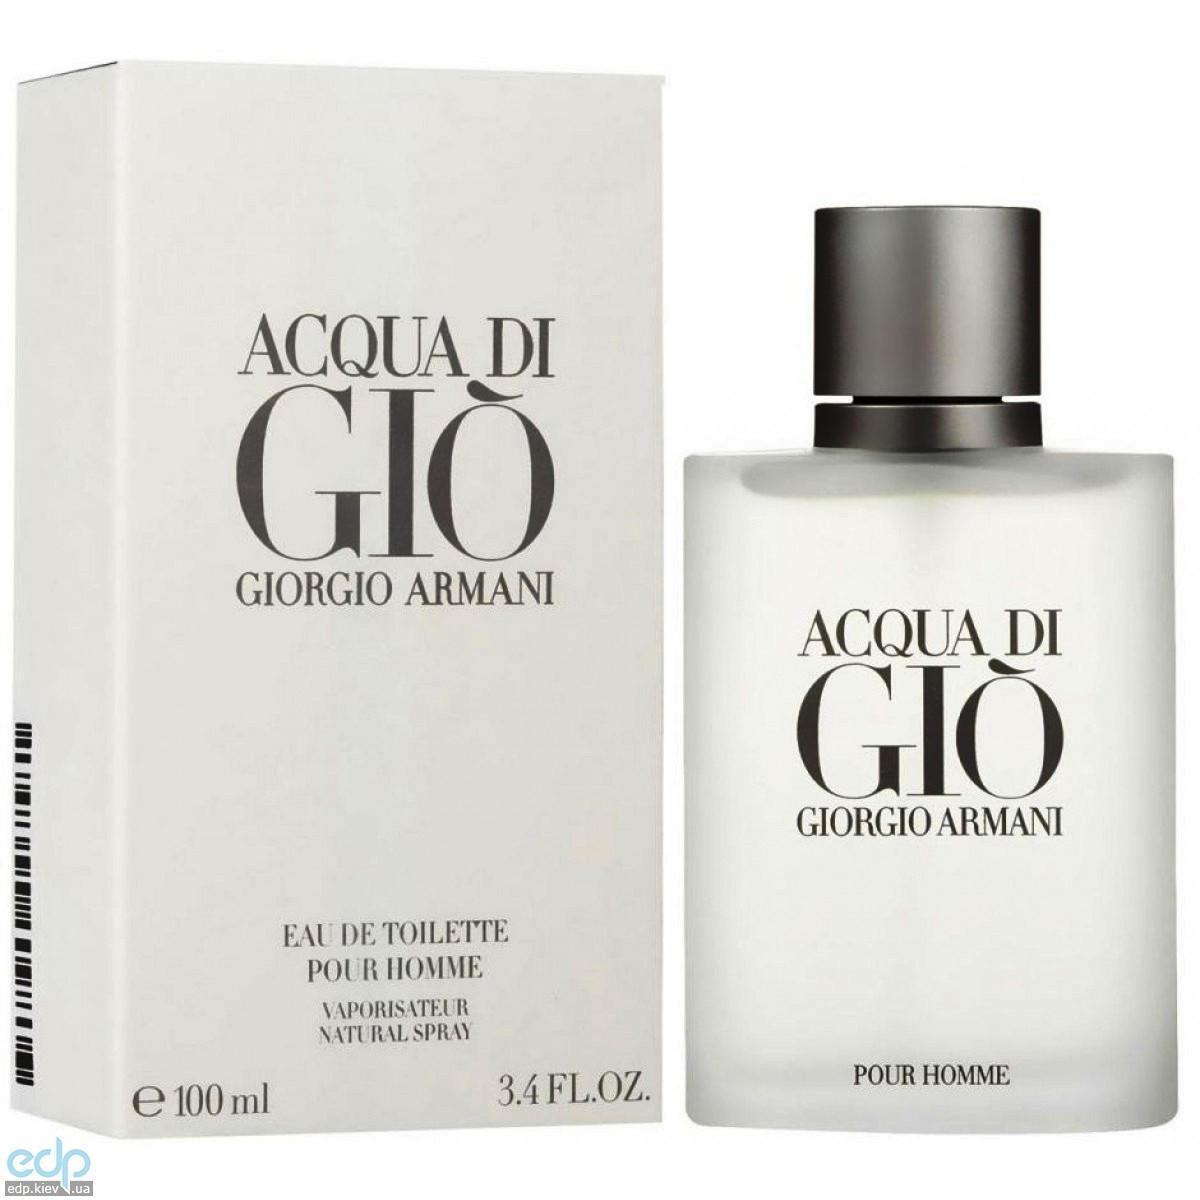 Giorgio Armani Acqua di Gio pour homme -  Набор (туалетная вода 50 + гель для душа 50 + бальзам после бритья 50)